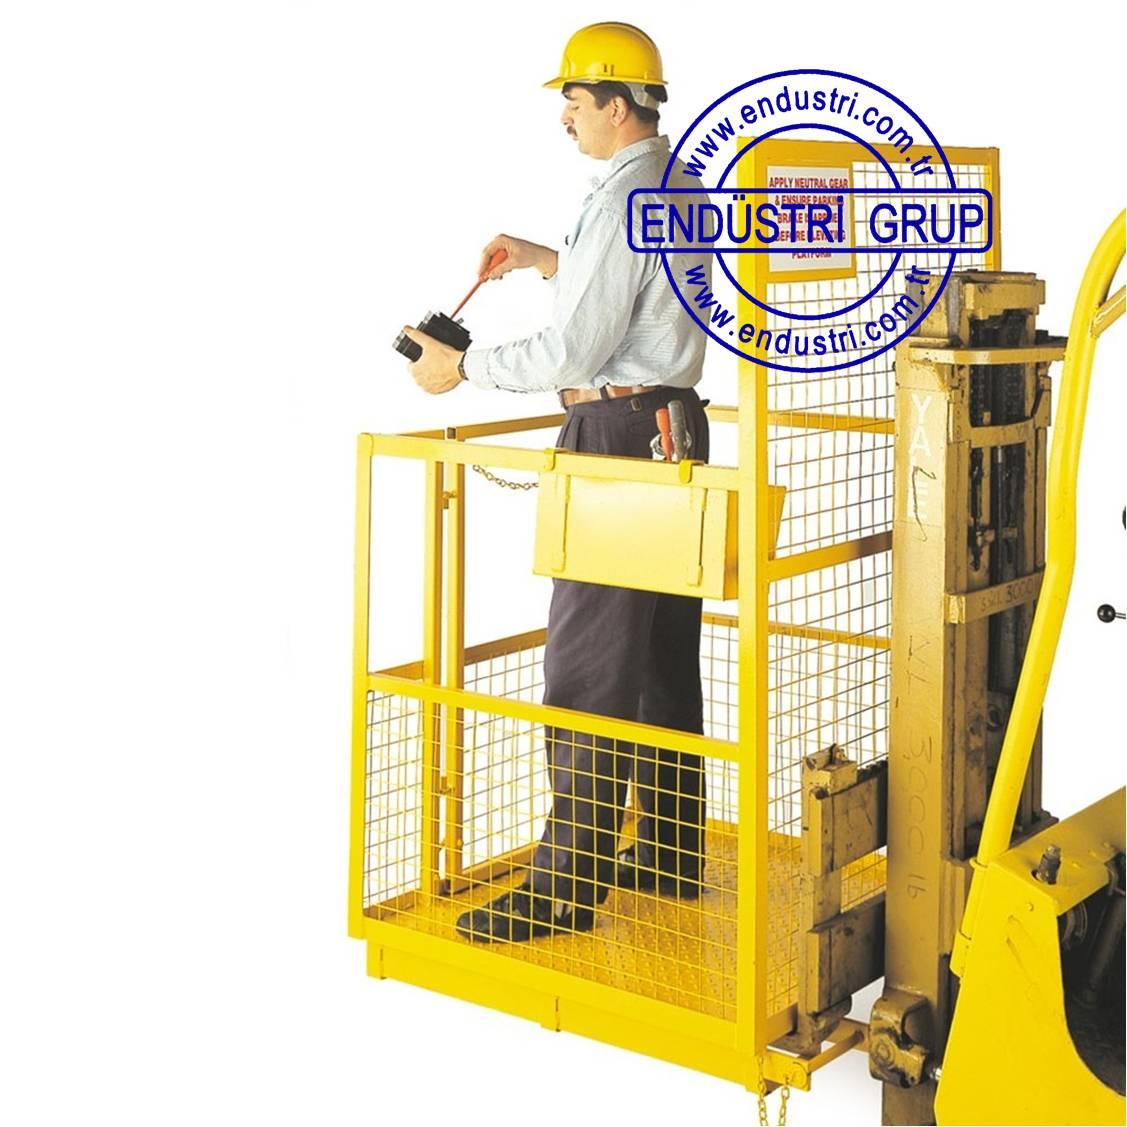 forklift-insan-tasima-sepeti-calisma-bakim-tamir-platformu-forklift-sepetleri-imalati-fiyati-cesitleri (31)